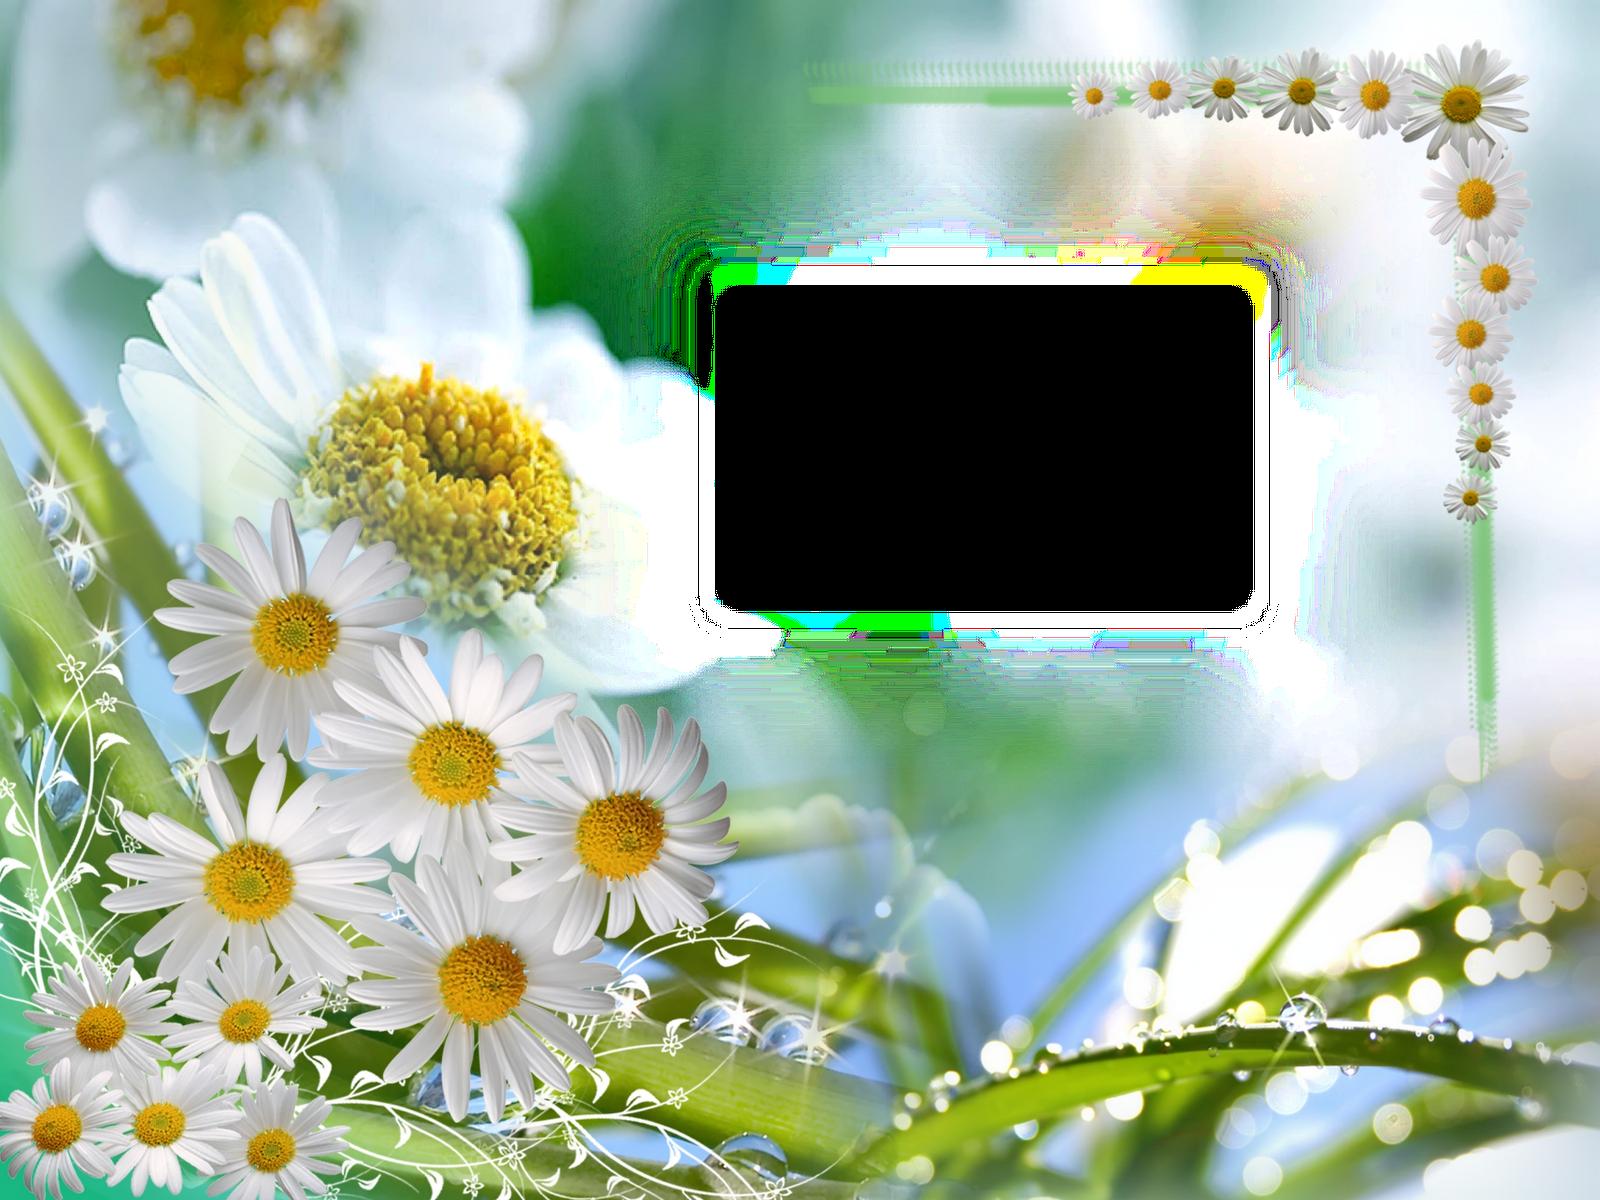 Download HD Download Fondos Para Bodas Gratis Png Clipart.